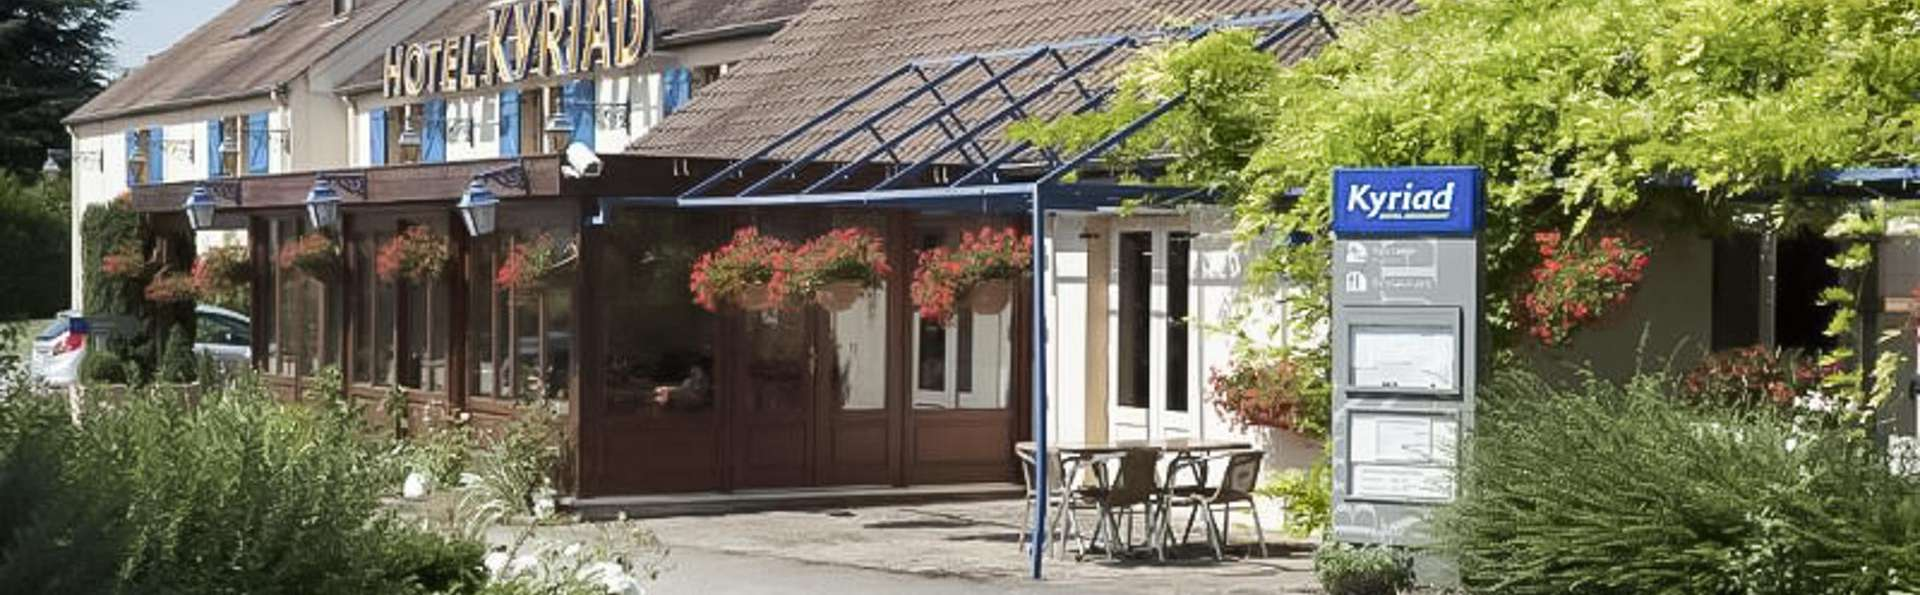 Hôtel Kyriad Beaune - EDIT_FRONT_02.jpg